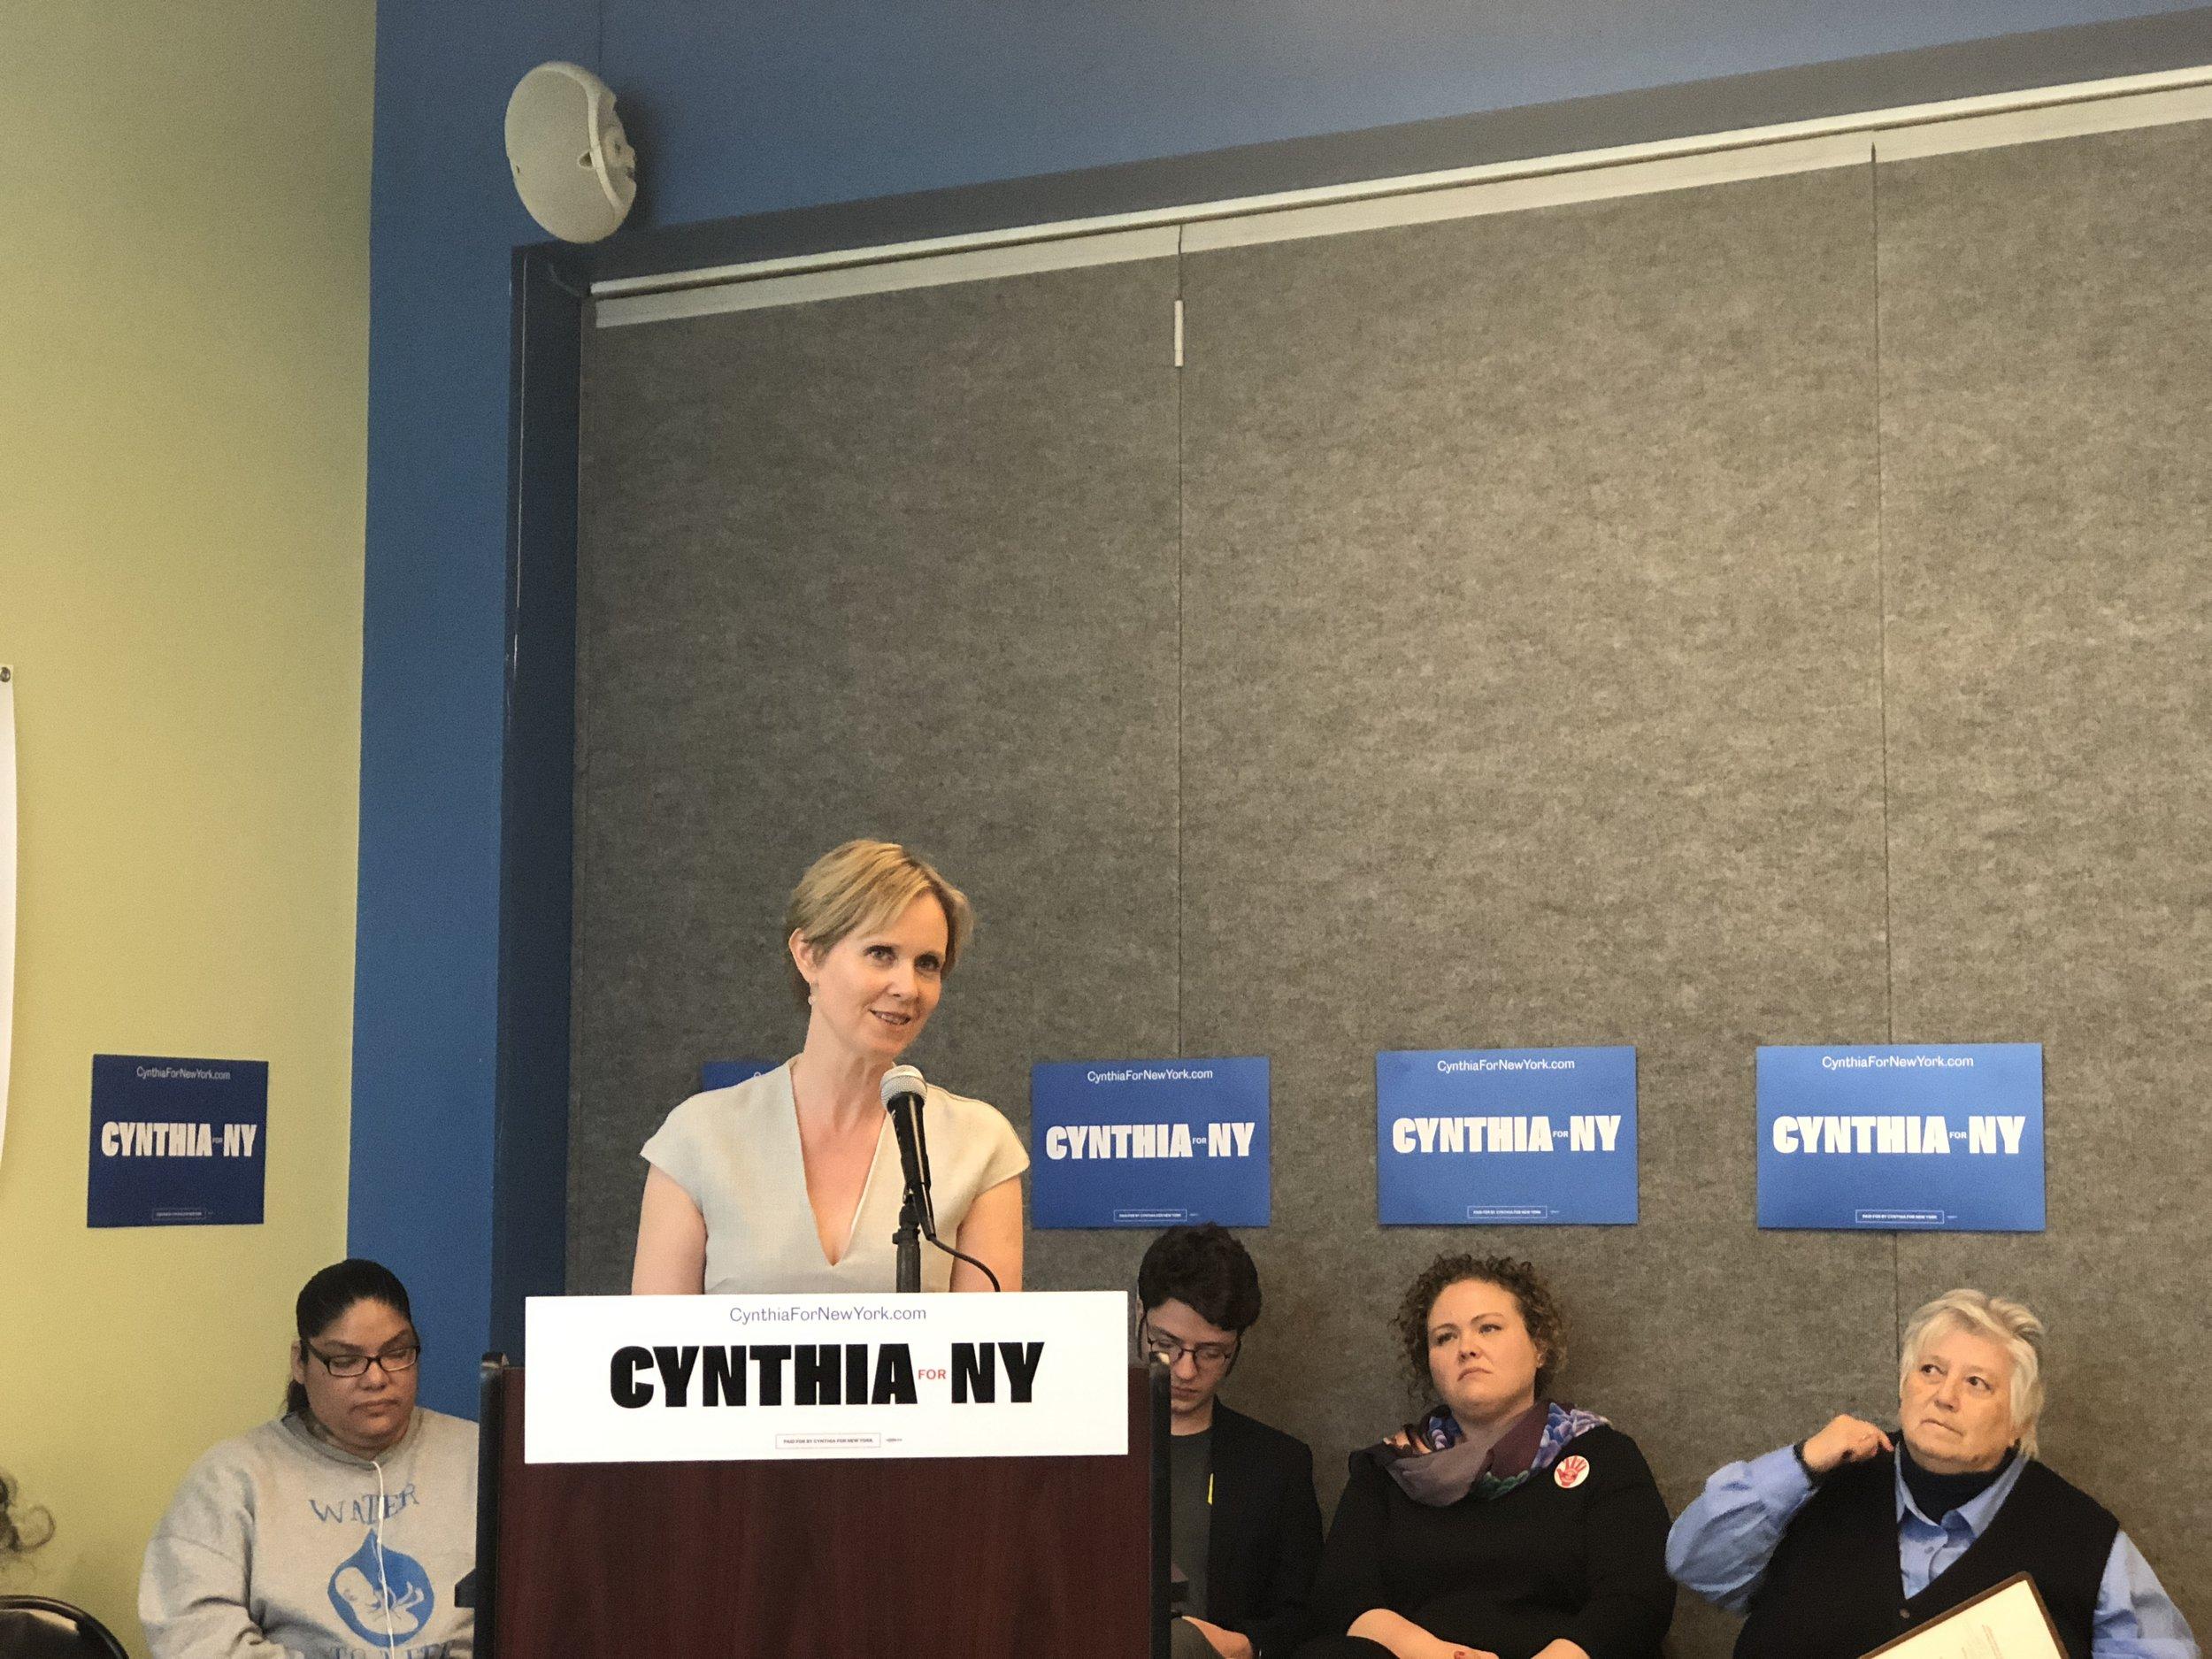 Candidate Cynthia Nixon